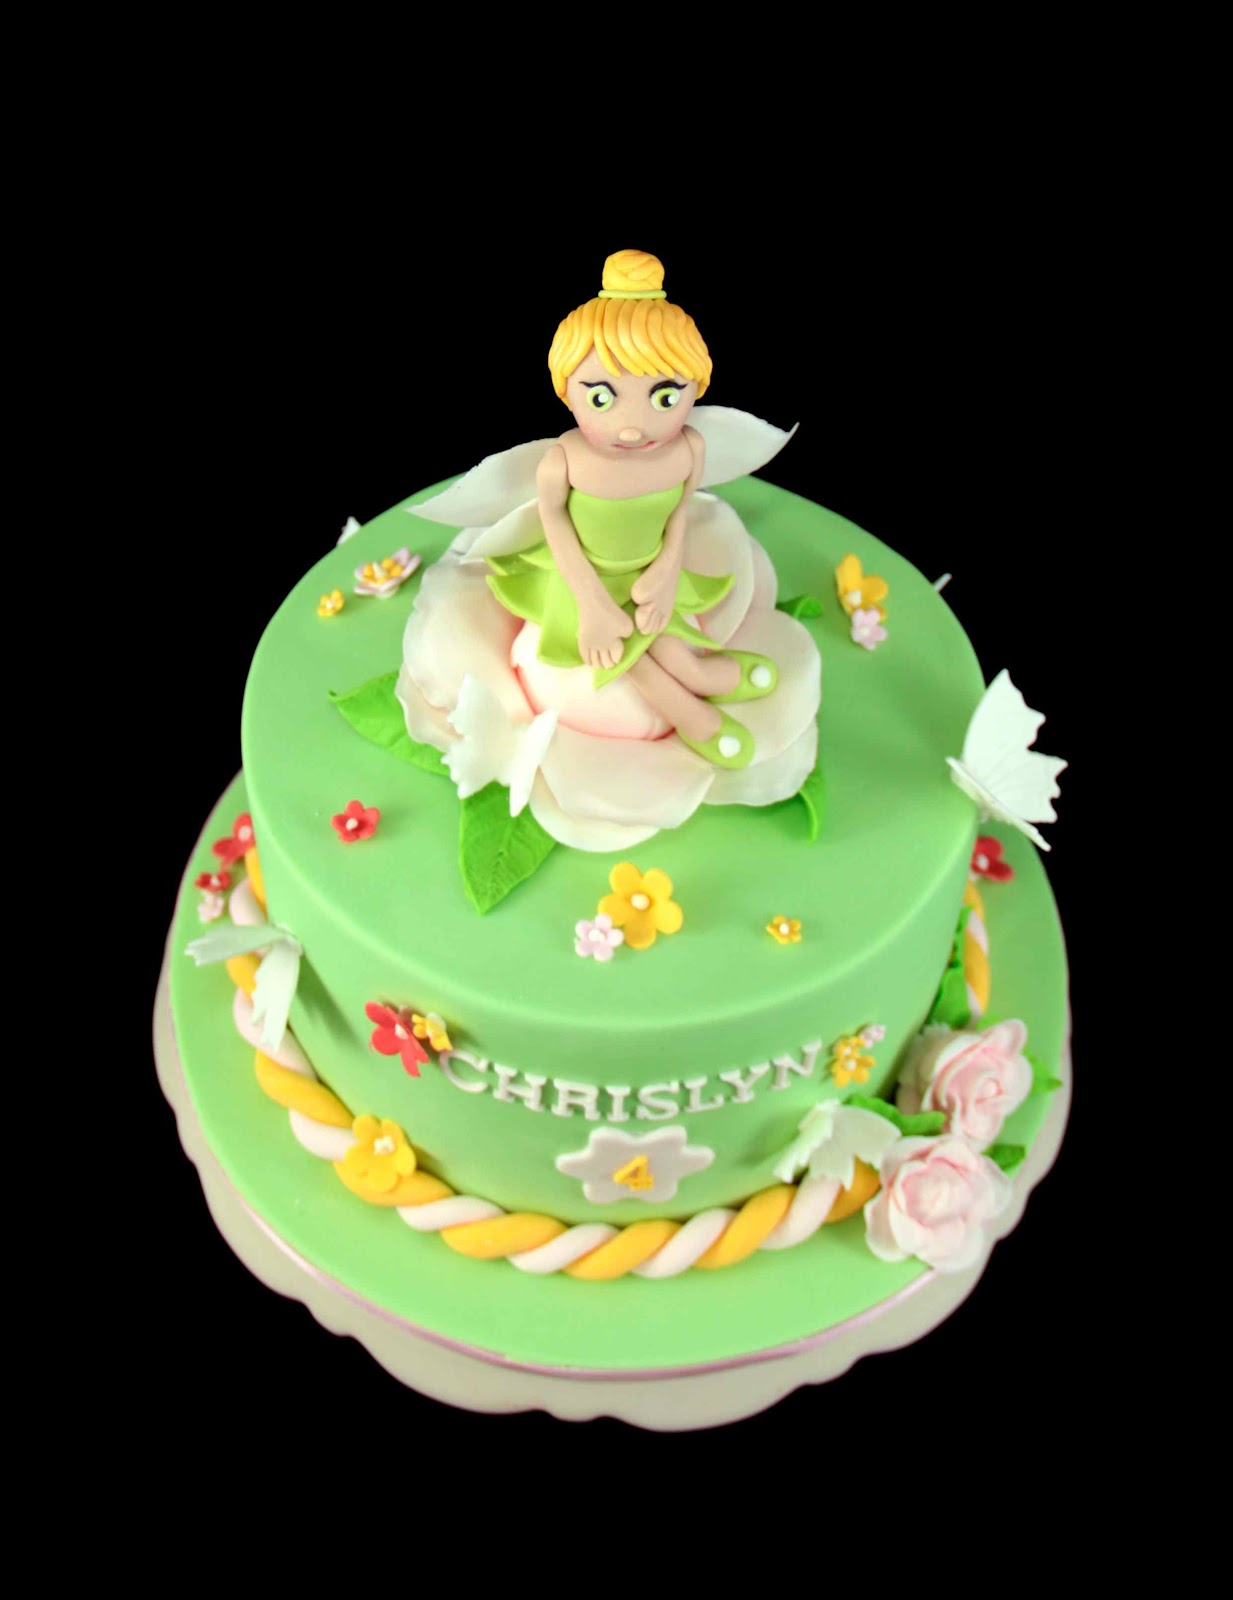 Bakerz Dad Tinker Bell Cake